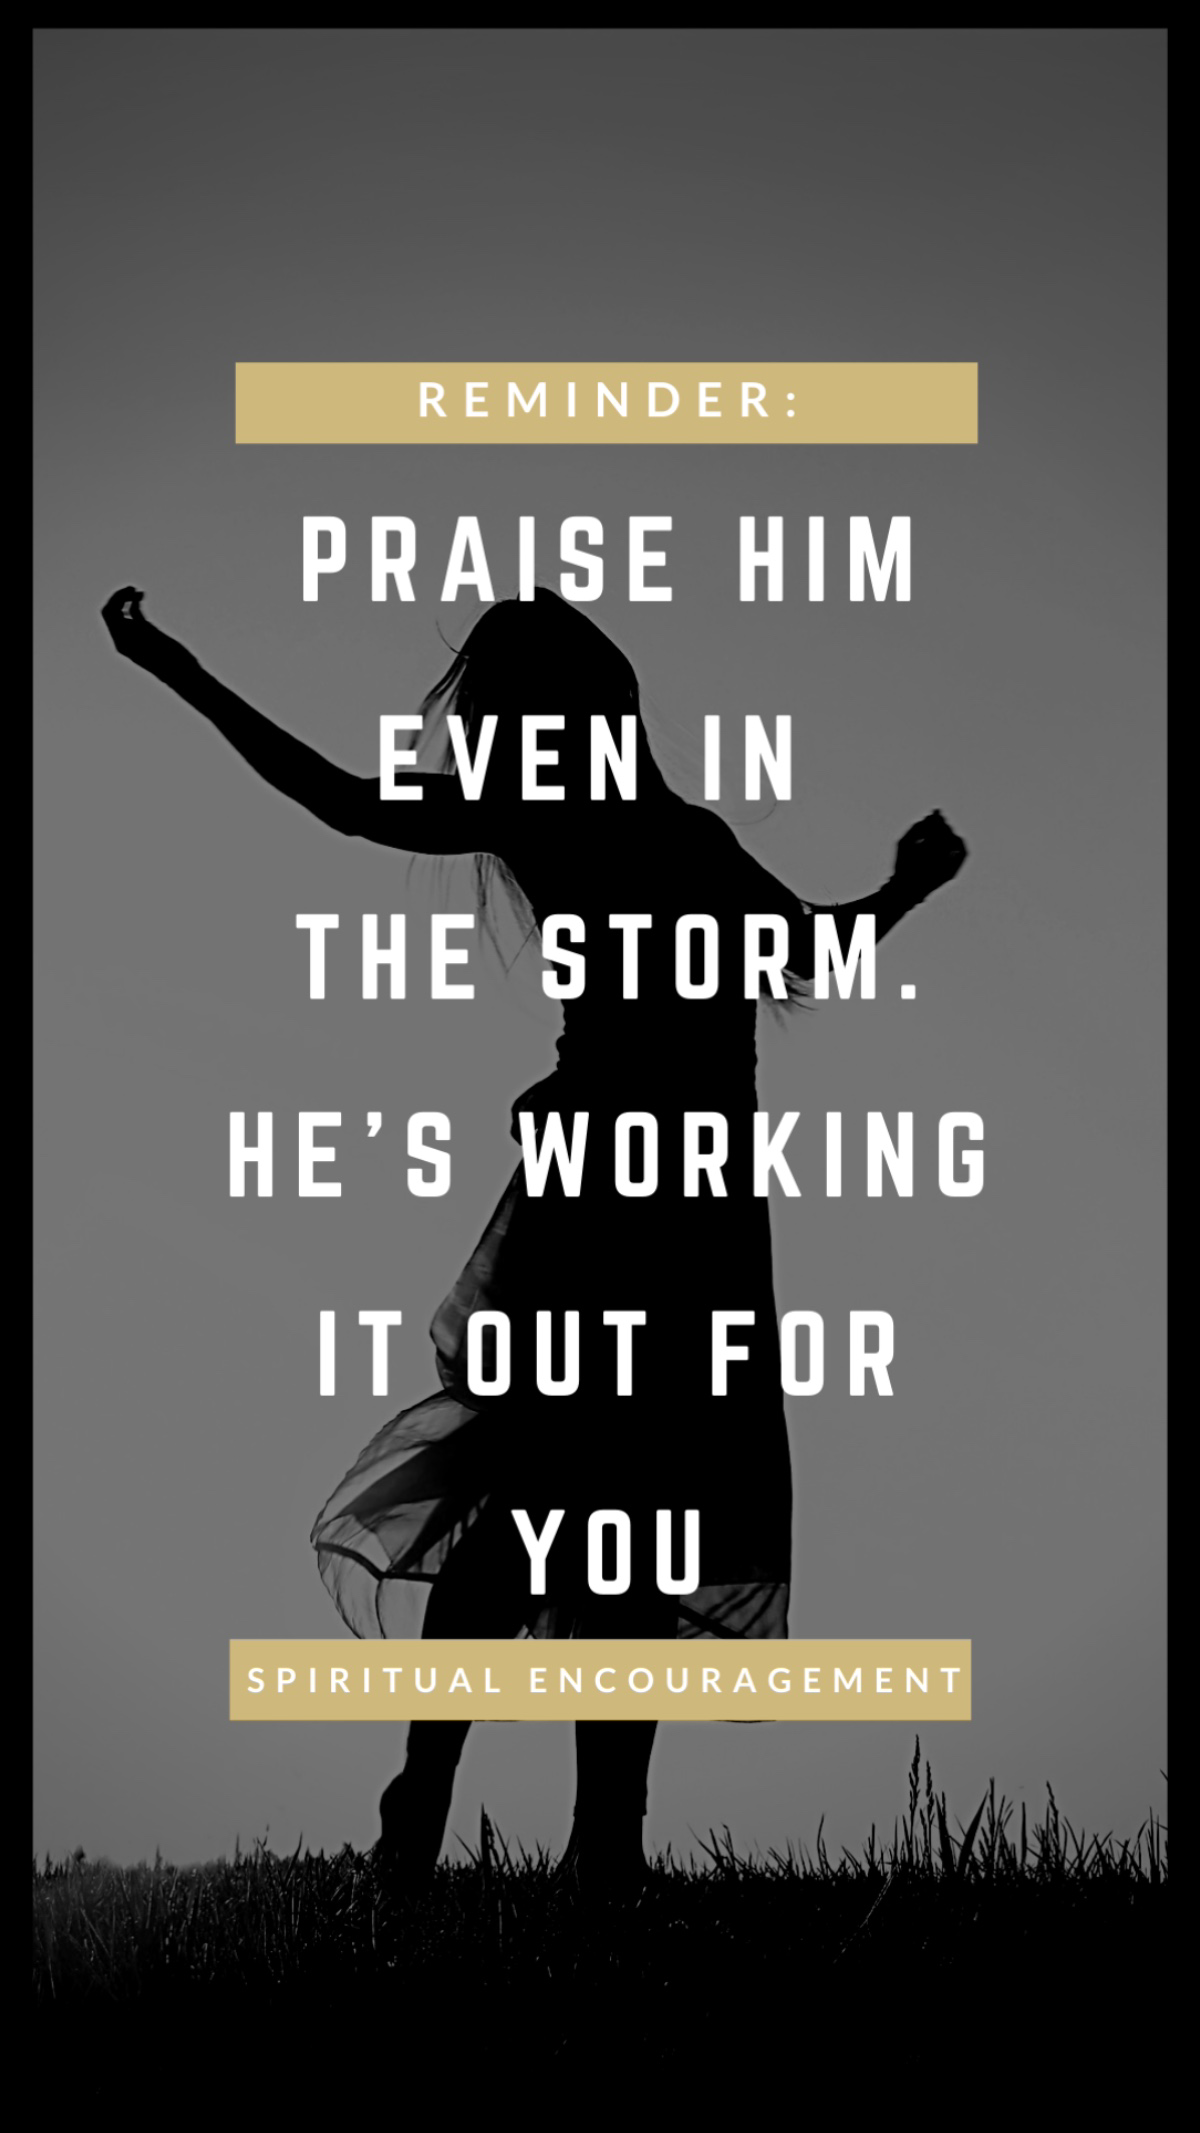 Spiritual Encouragement for Women